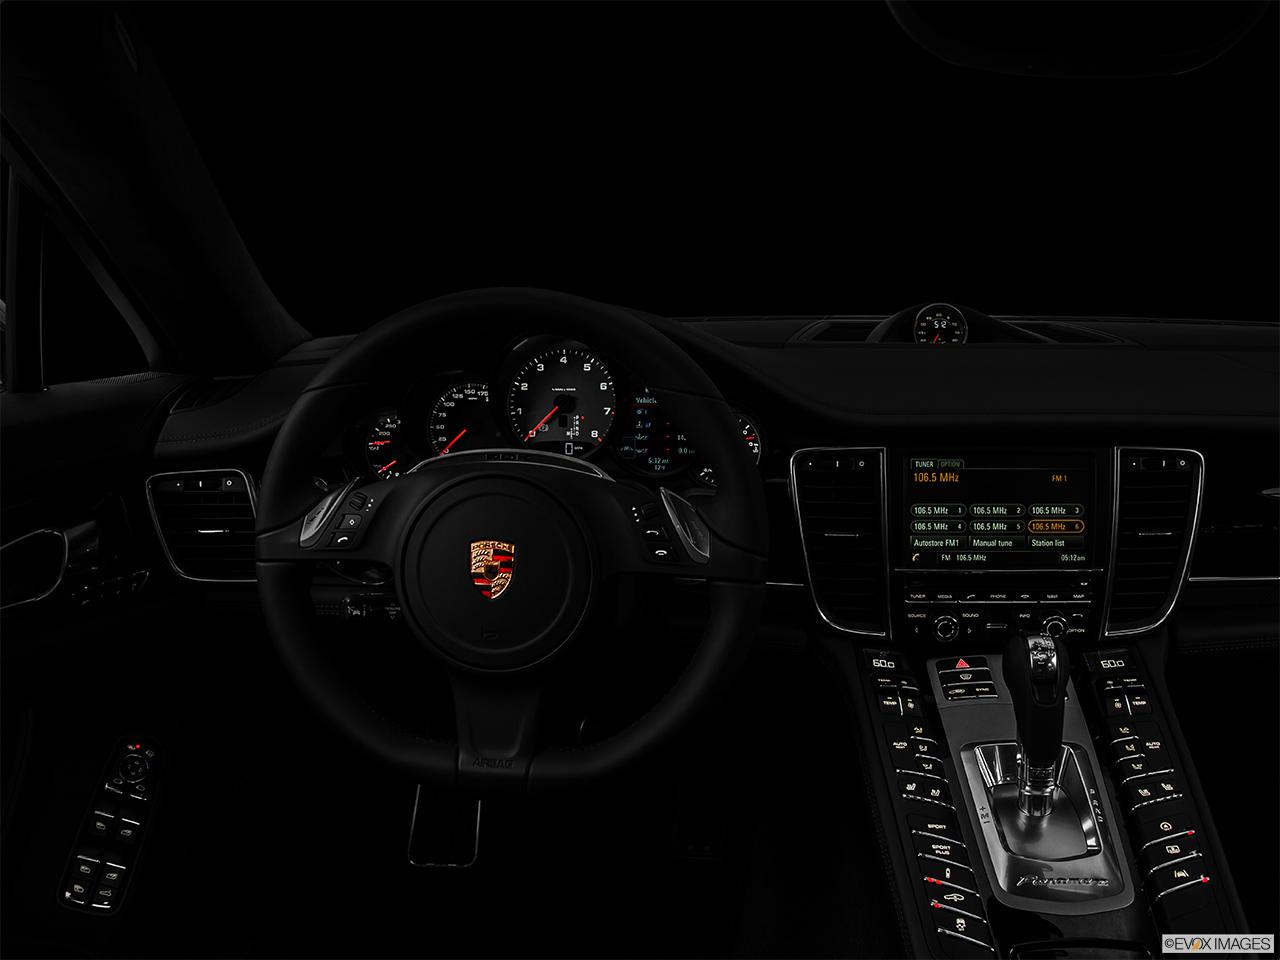 2014 porsche panamera interior car tuning - 2014 Porsche Panamera 4dr Hatchback 4s Executive Centered Wide Dash Shot Night